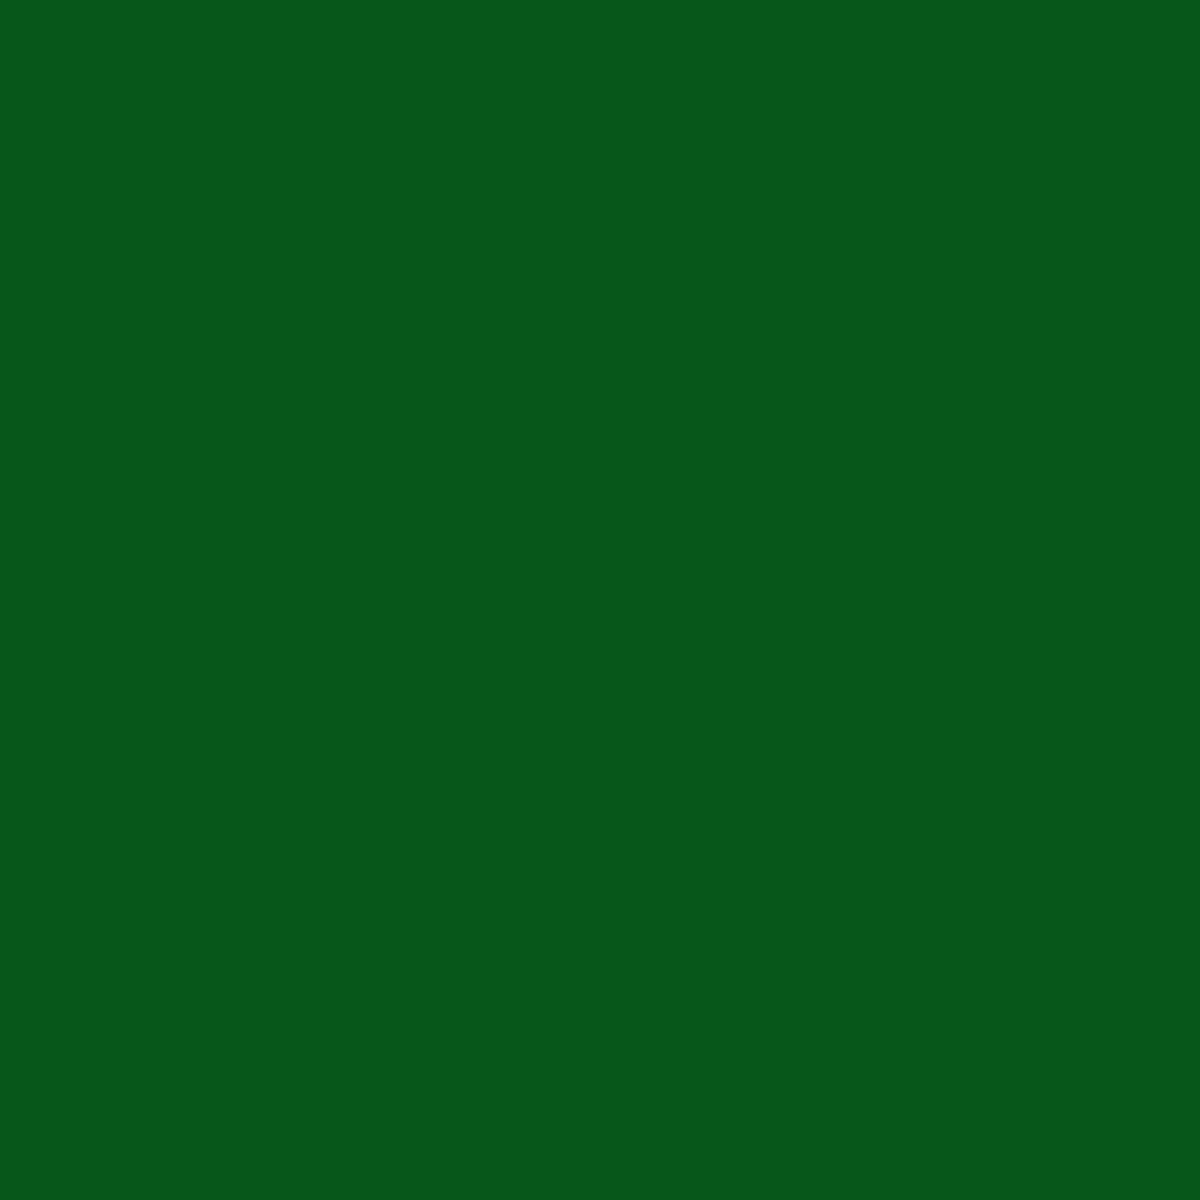 Green, British Racing